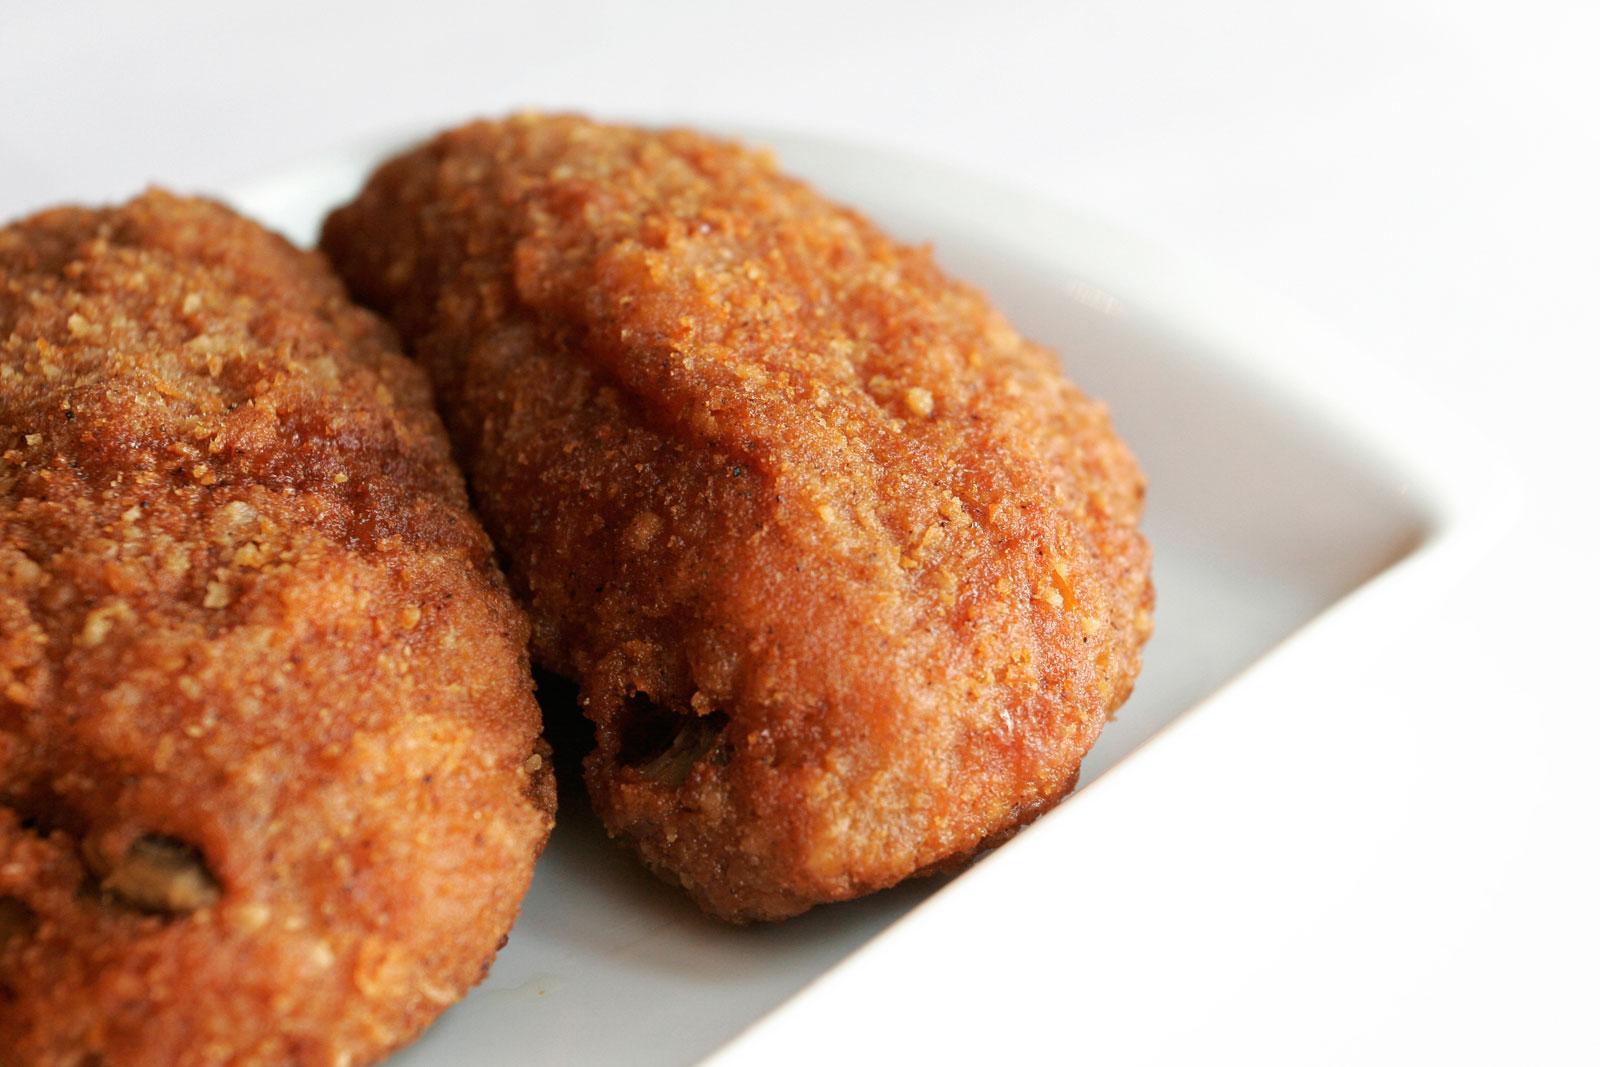 chicken nugget wikipedia